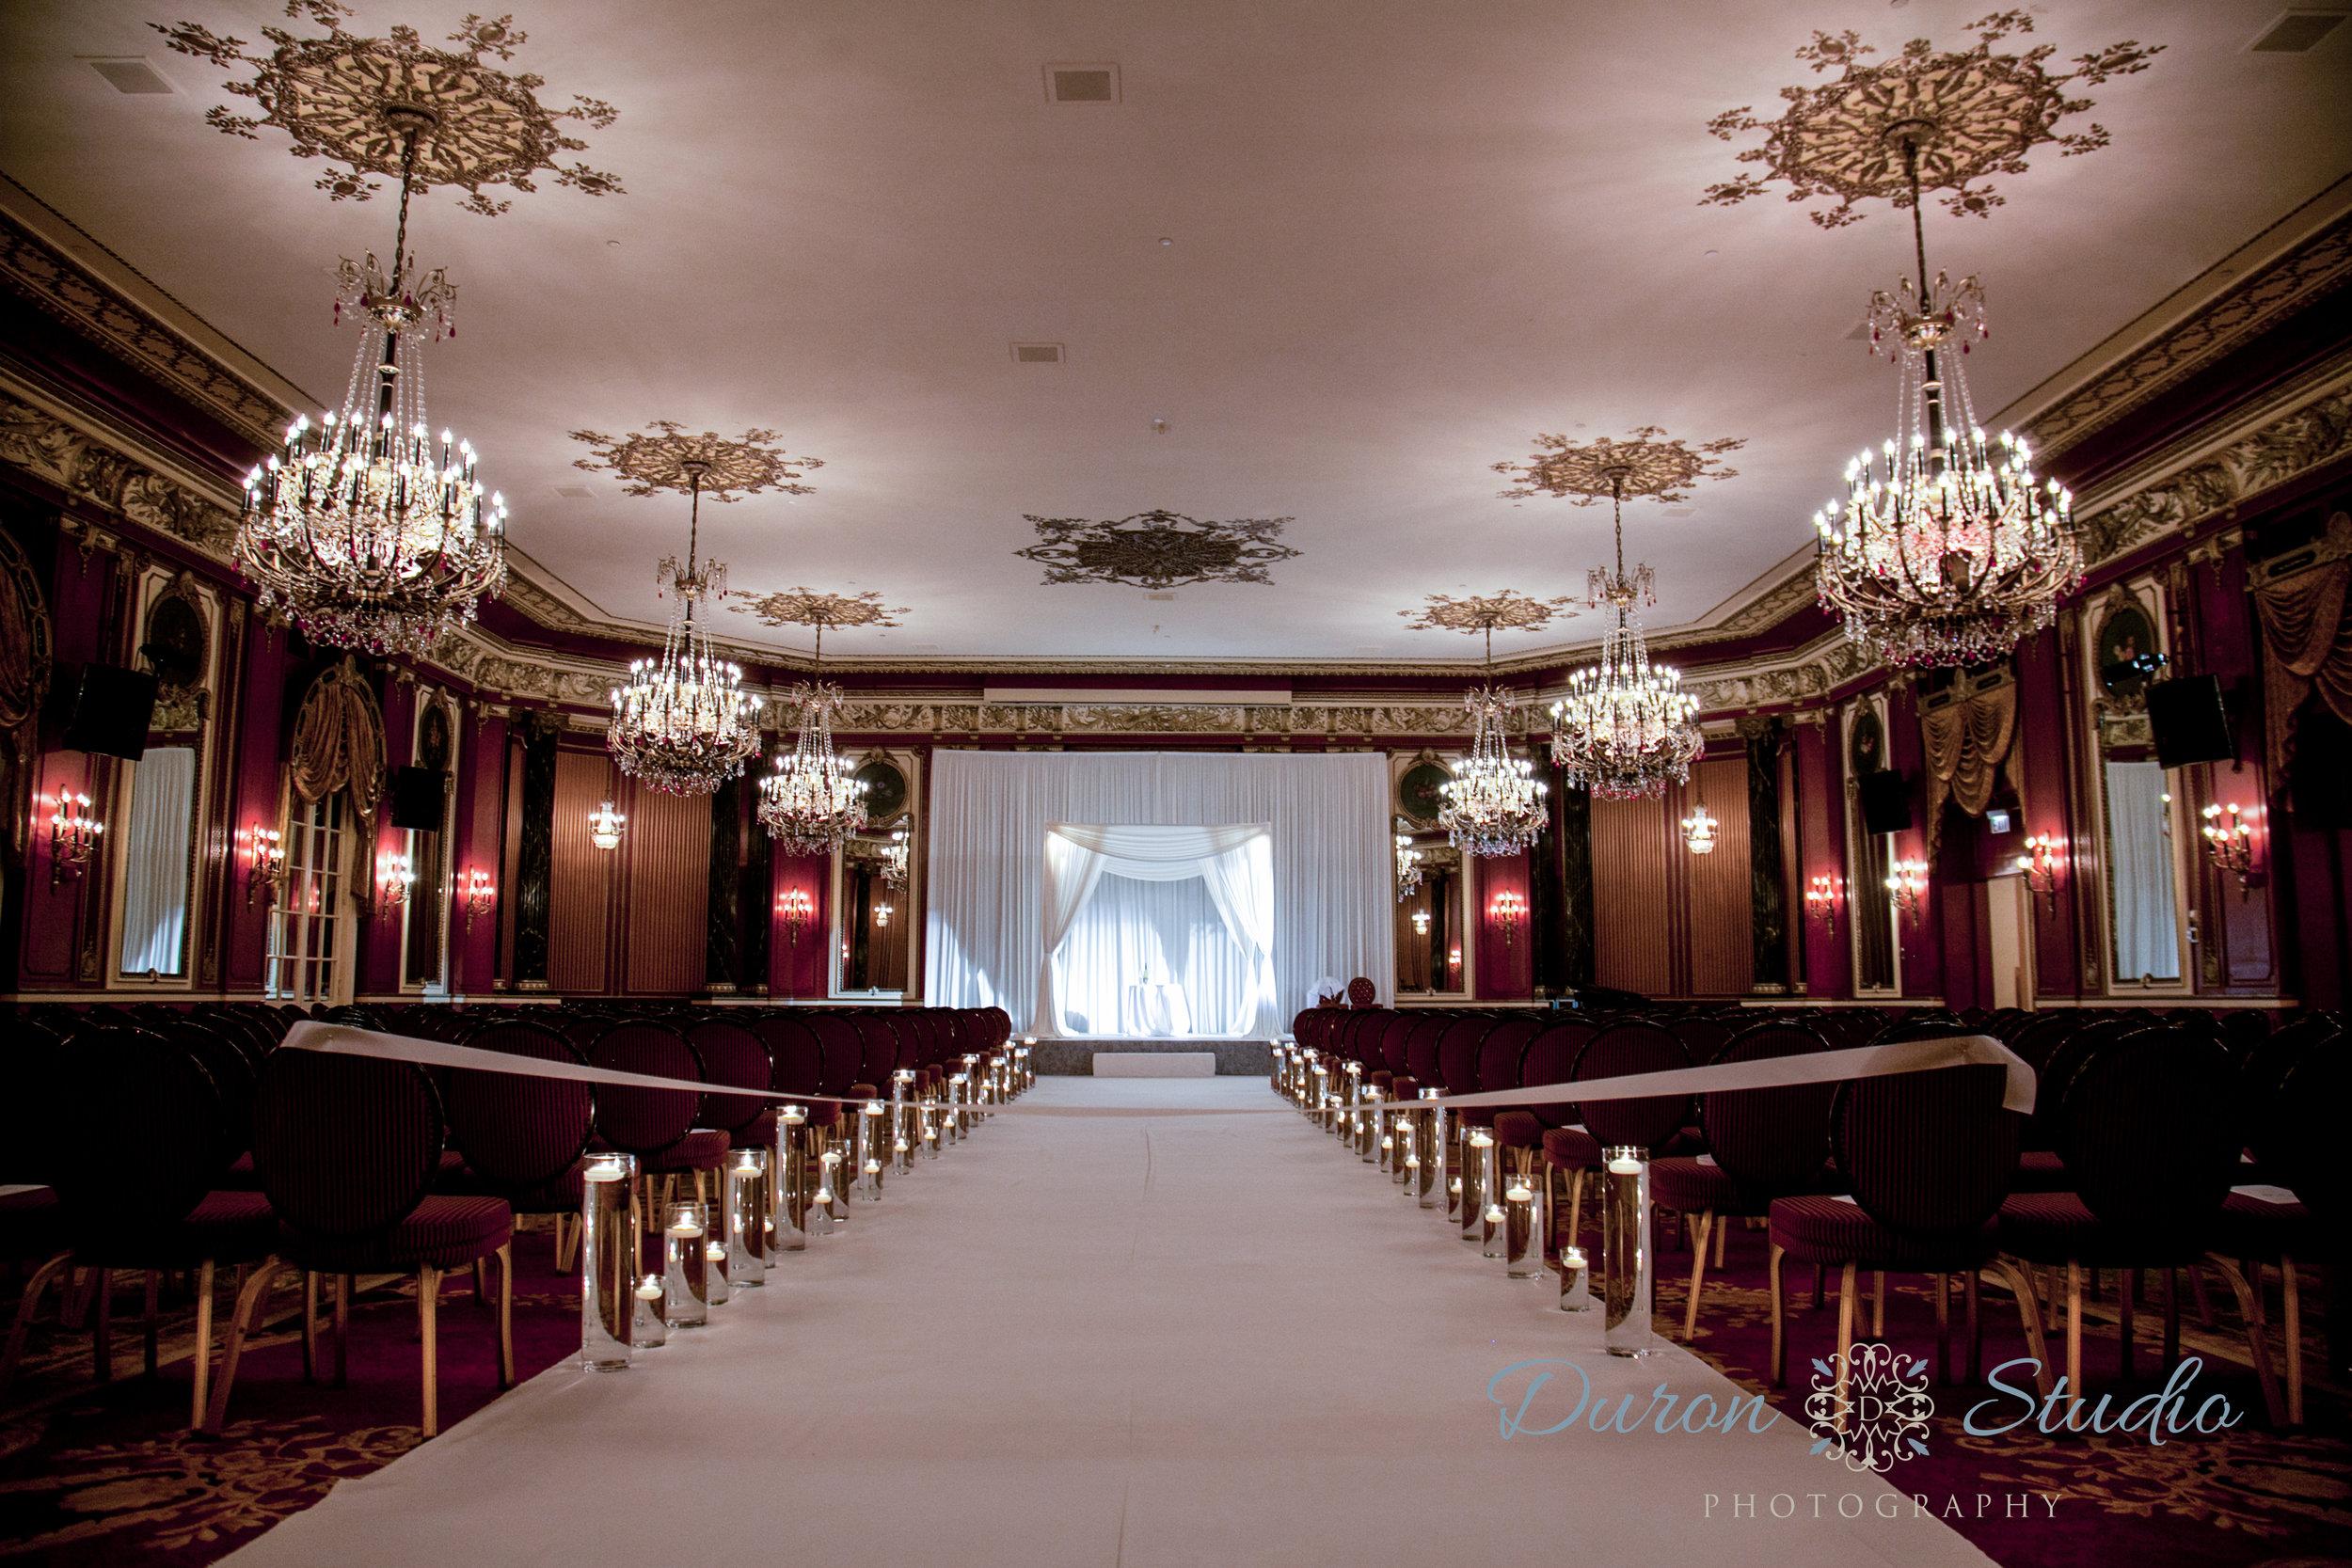 Palmer_House_wedding_Duron_Studio_photography_001.jpg